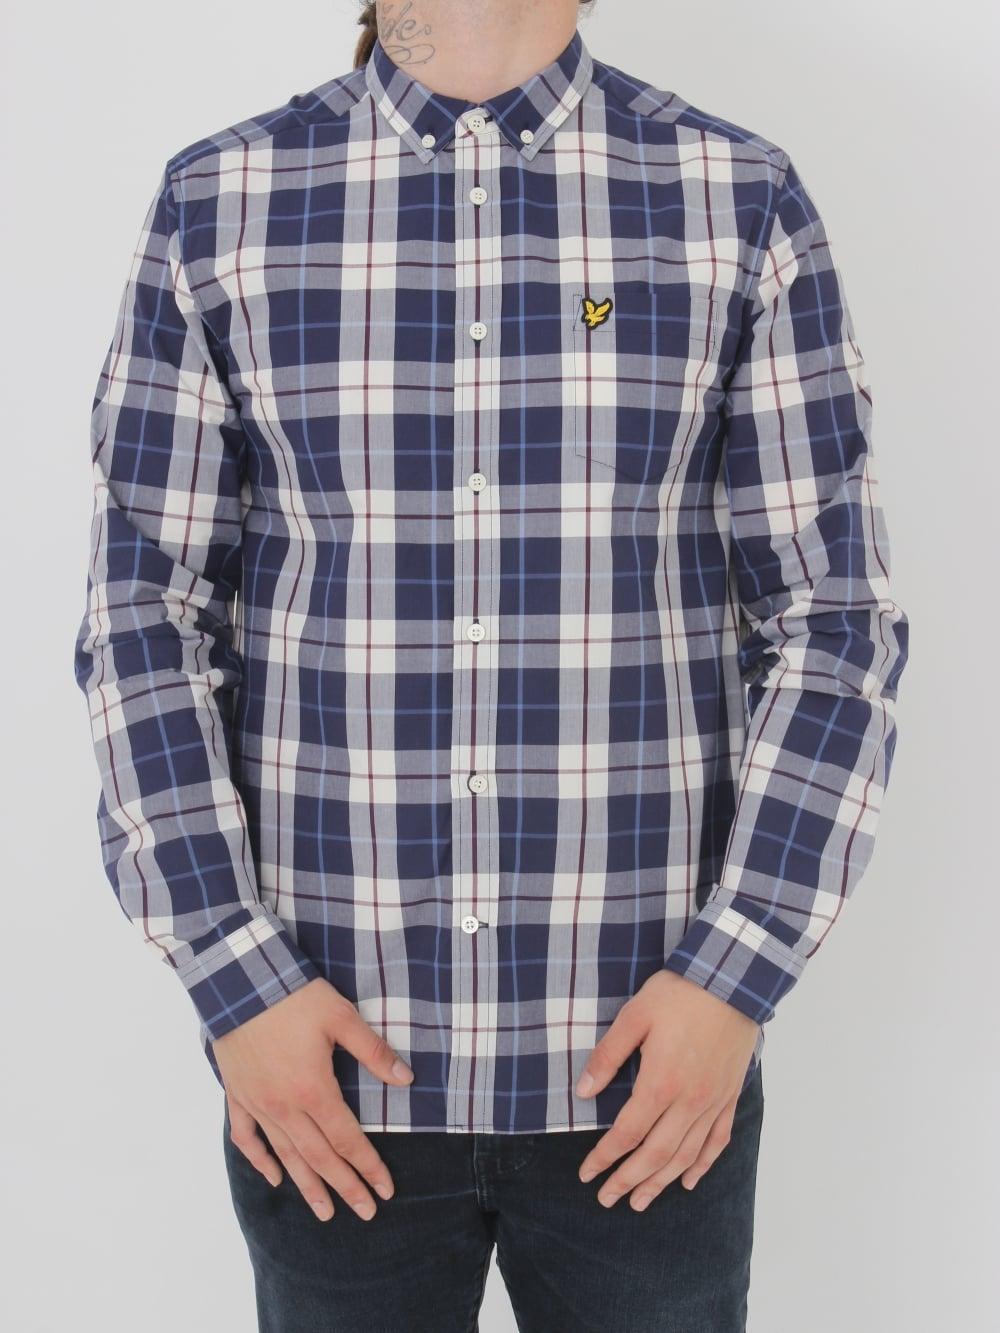 49b770c2632b Lyle   Scott Poplin Check Shirt in Off White - Northern Threads